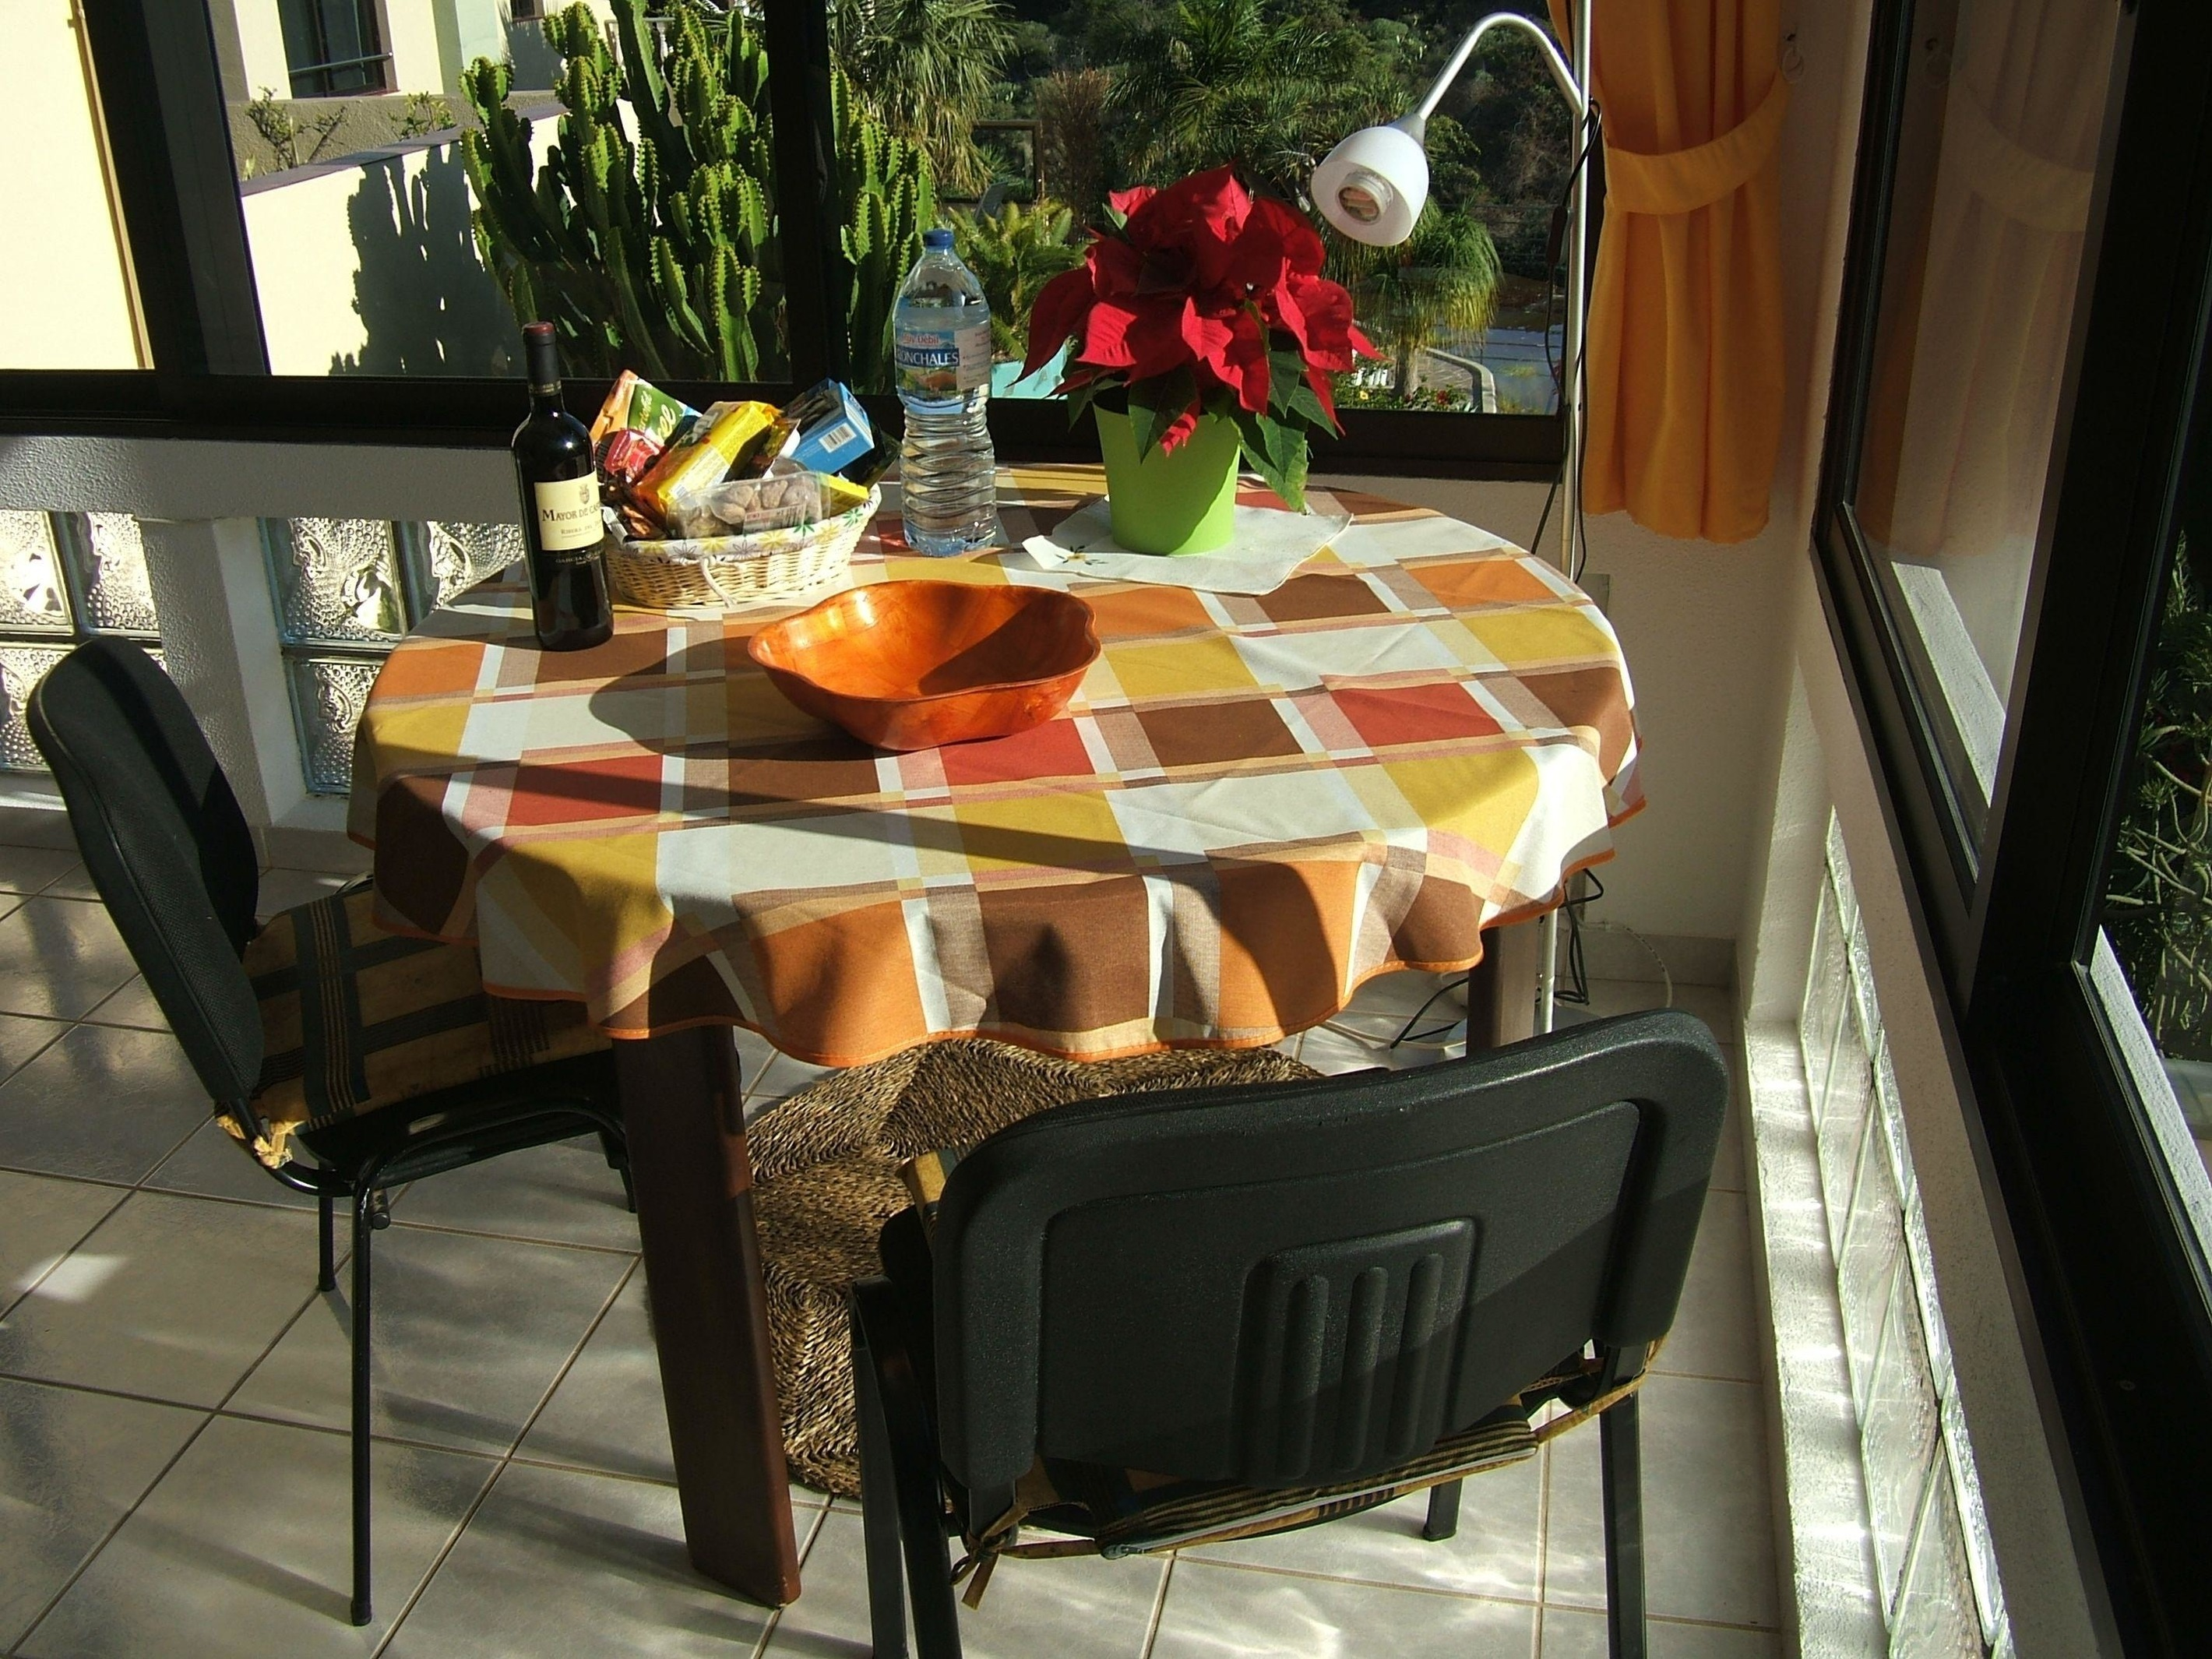 Appartement de vacances Fewo Strelitzia, im Grünen, am kleinen See, direkt am Strelitziengarten, mit Pool, Grill,  (2492987), Santa Ursula, Ténérife, Iles Canaries, Espagne, image 5